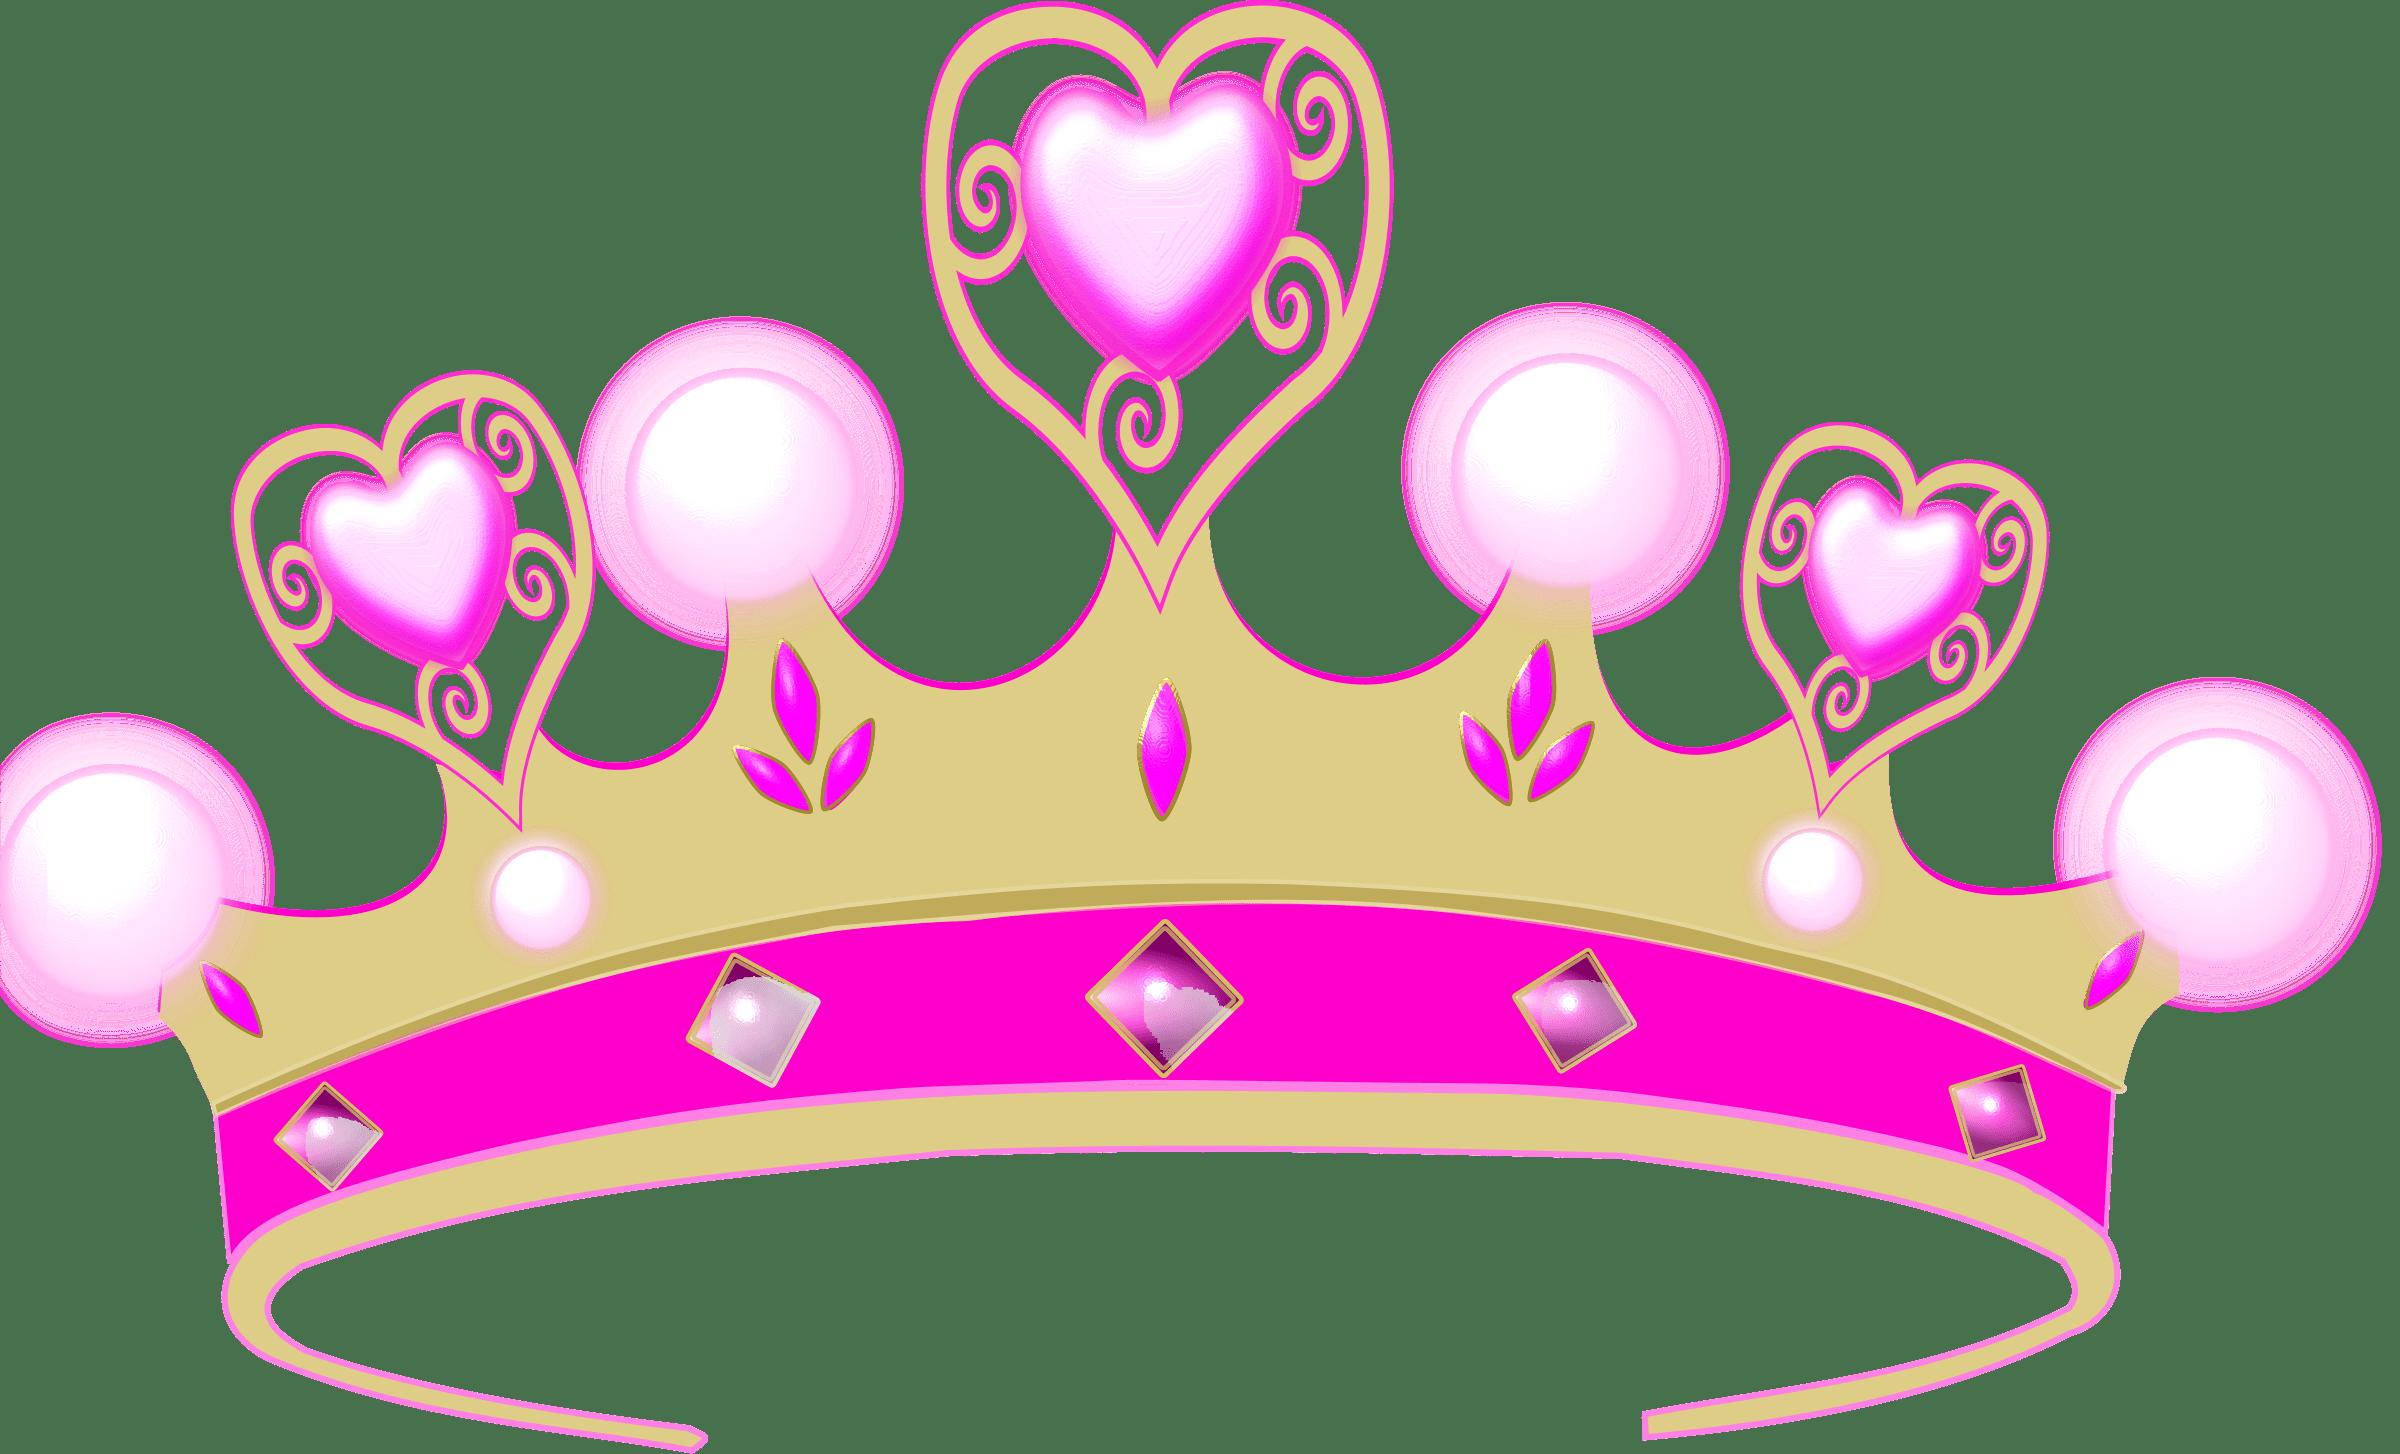 Princess Crown Images Png